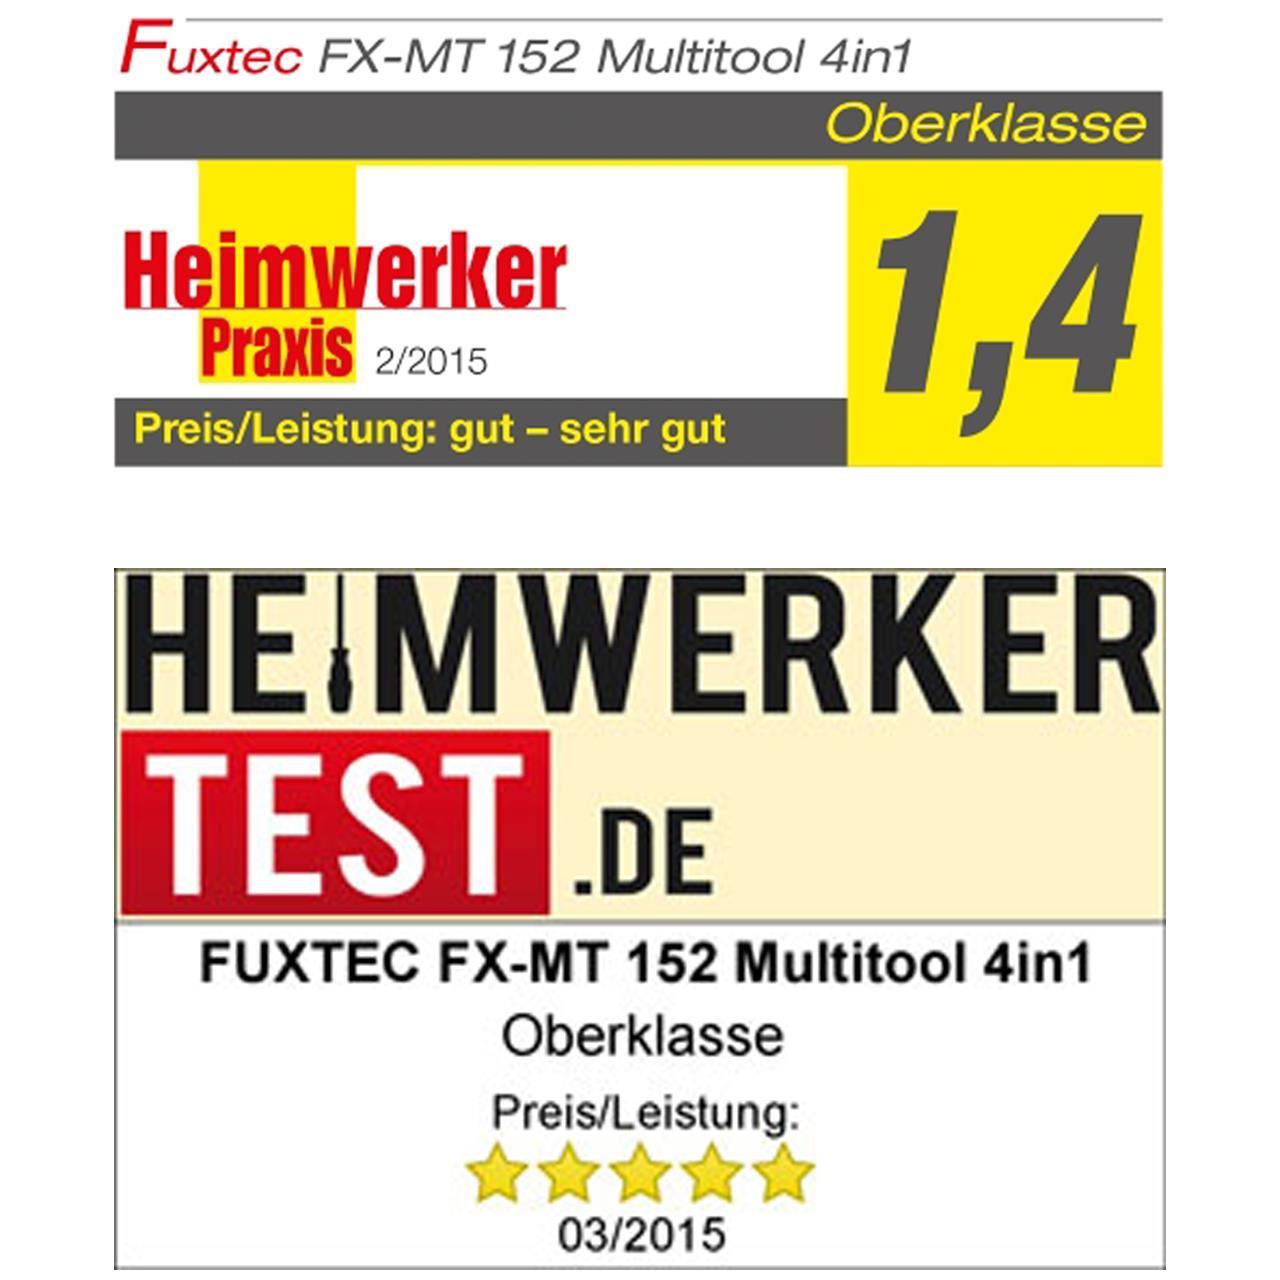 FUXTEC FX-MT152 Multitool 4in1 Benzin Motorsense